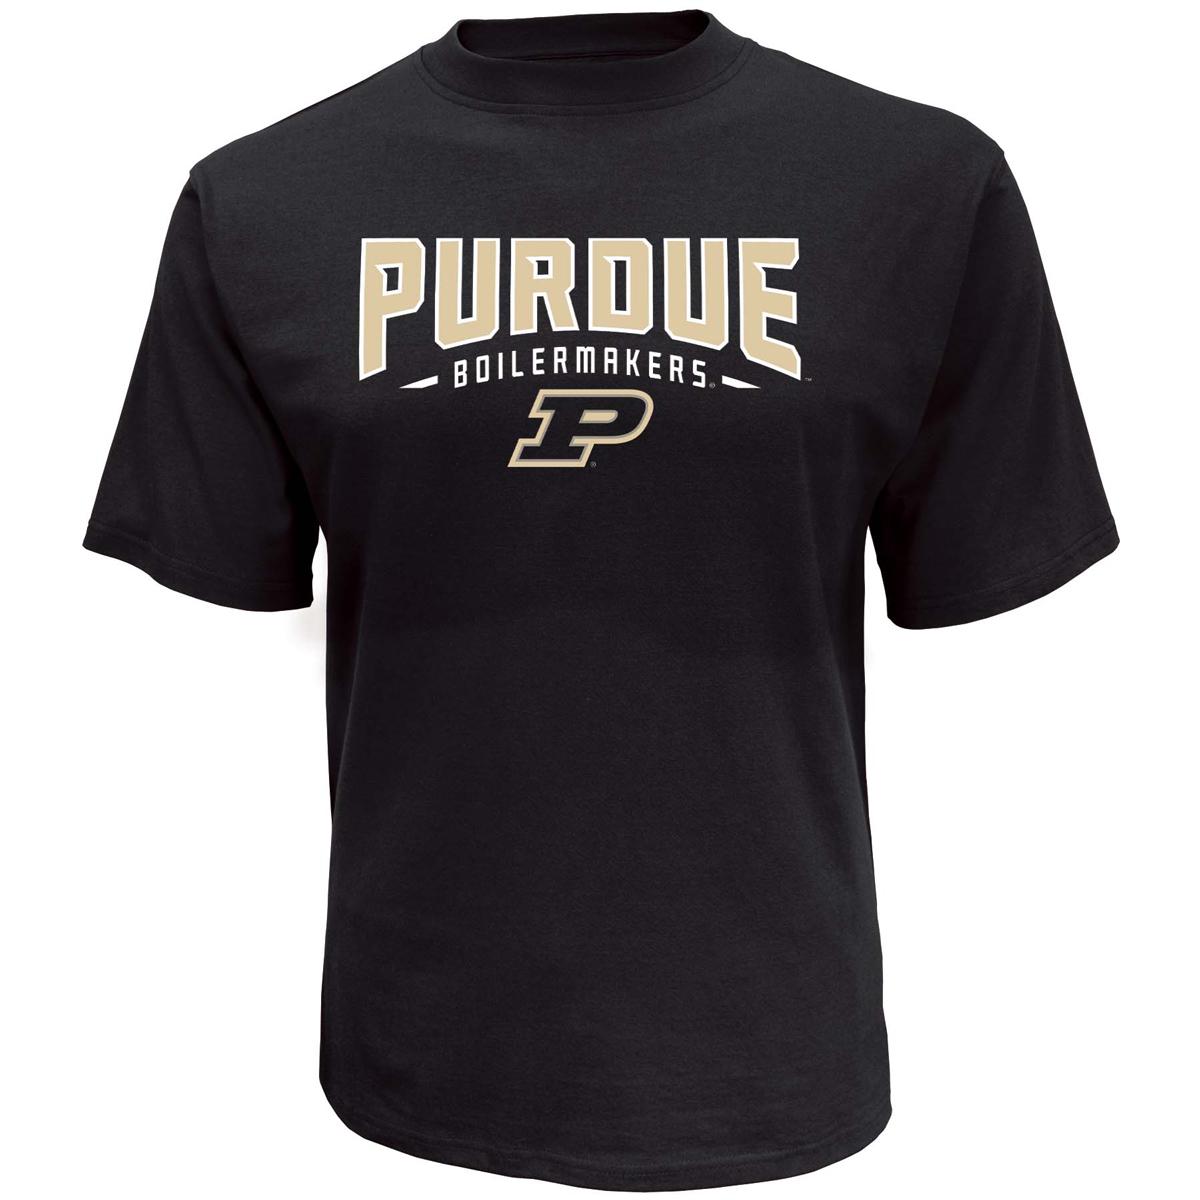 Men's Purdue Classic Arch Short Sleeve T-Shirt, Black, swatch